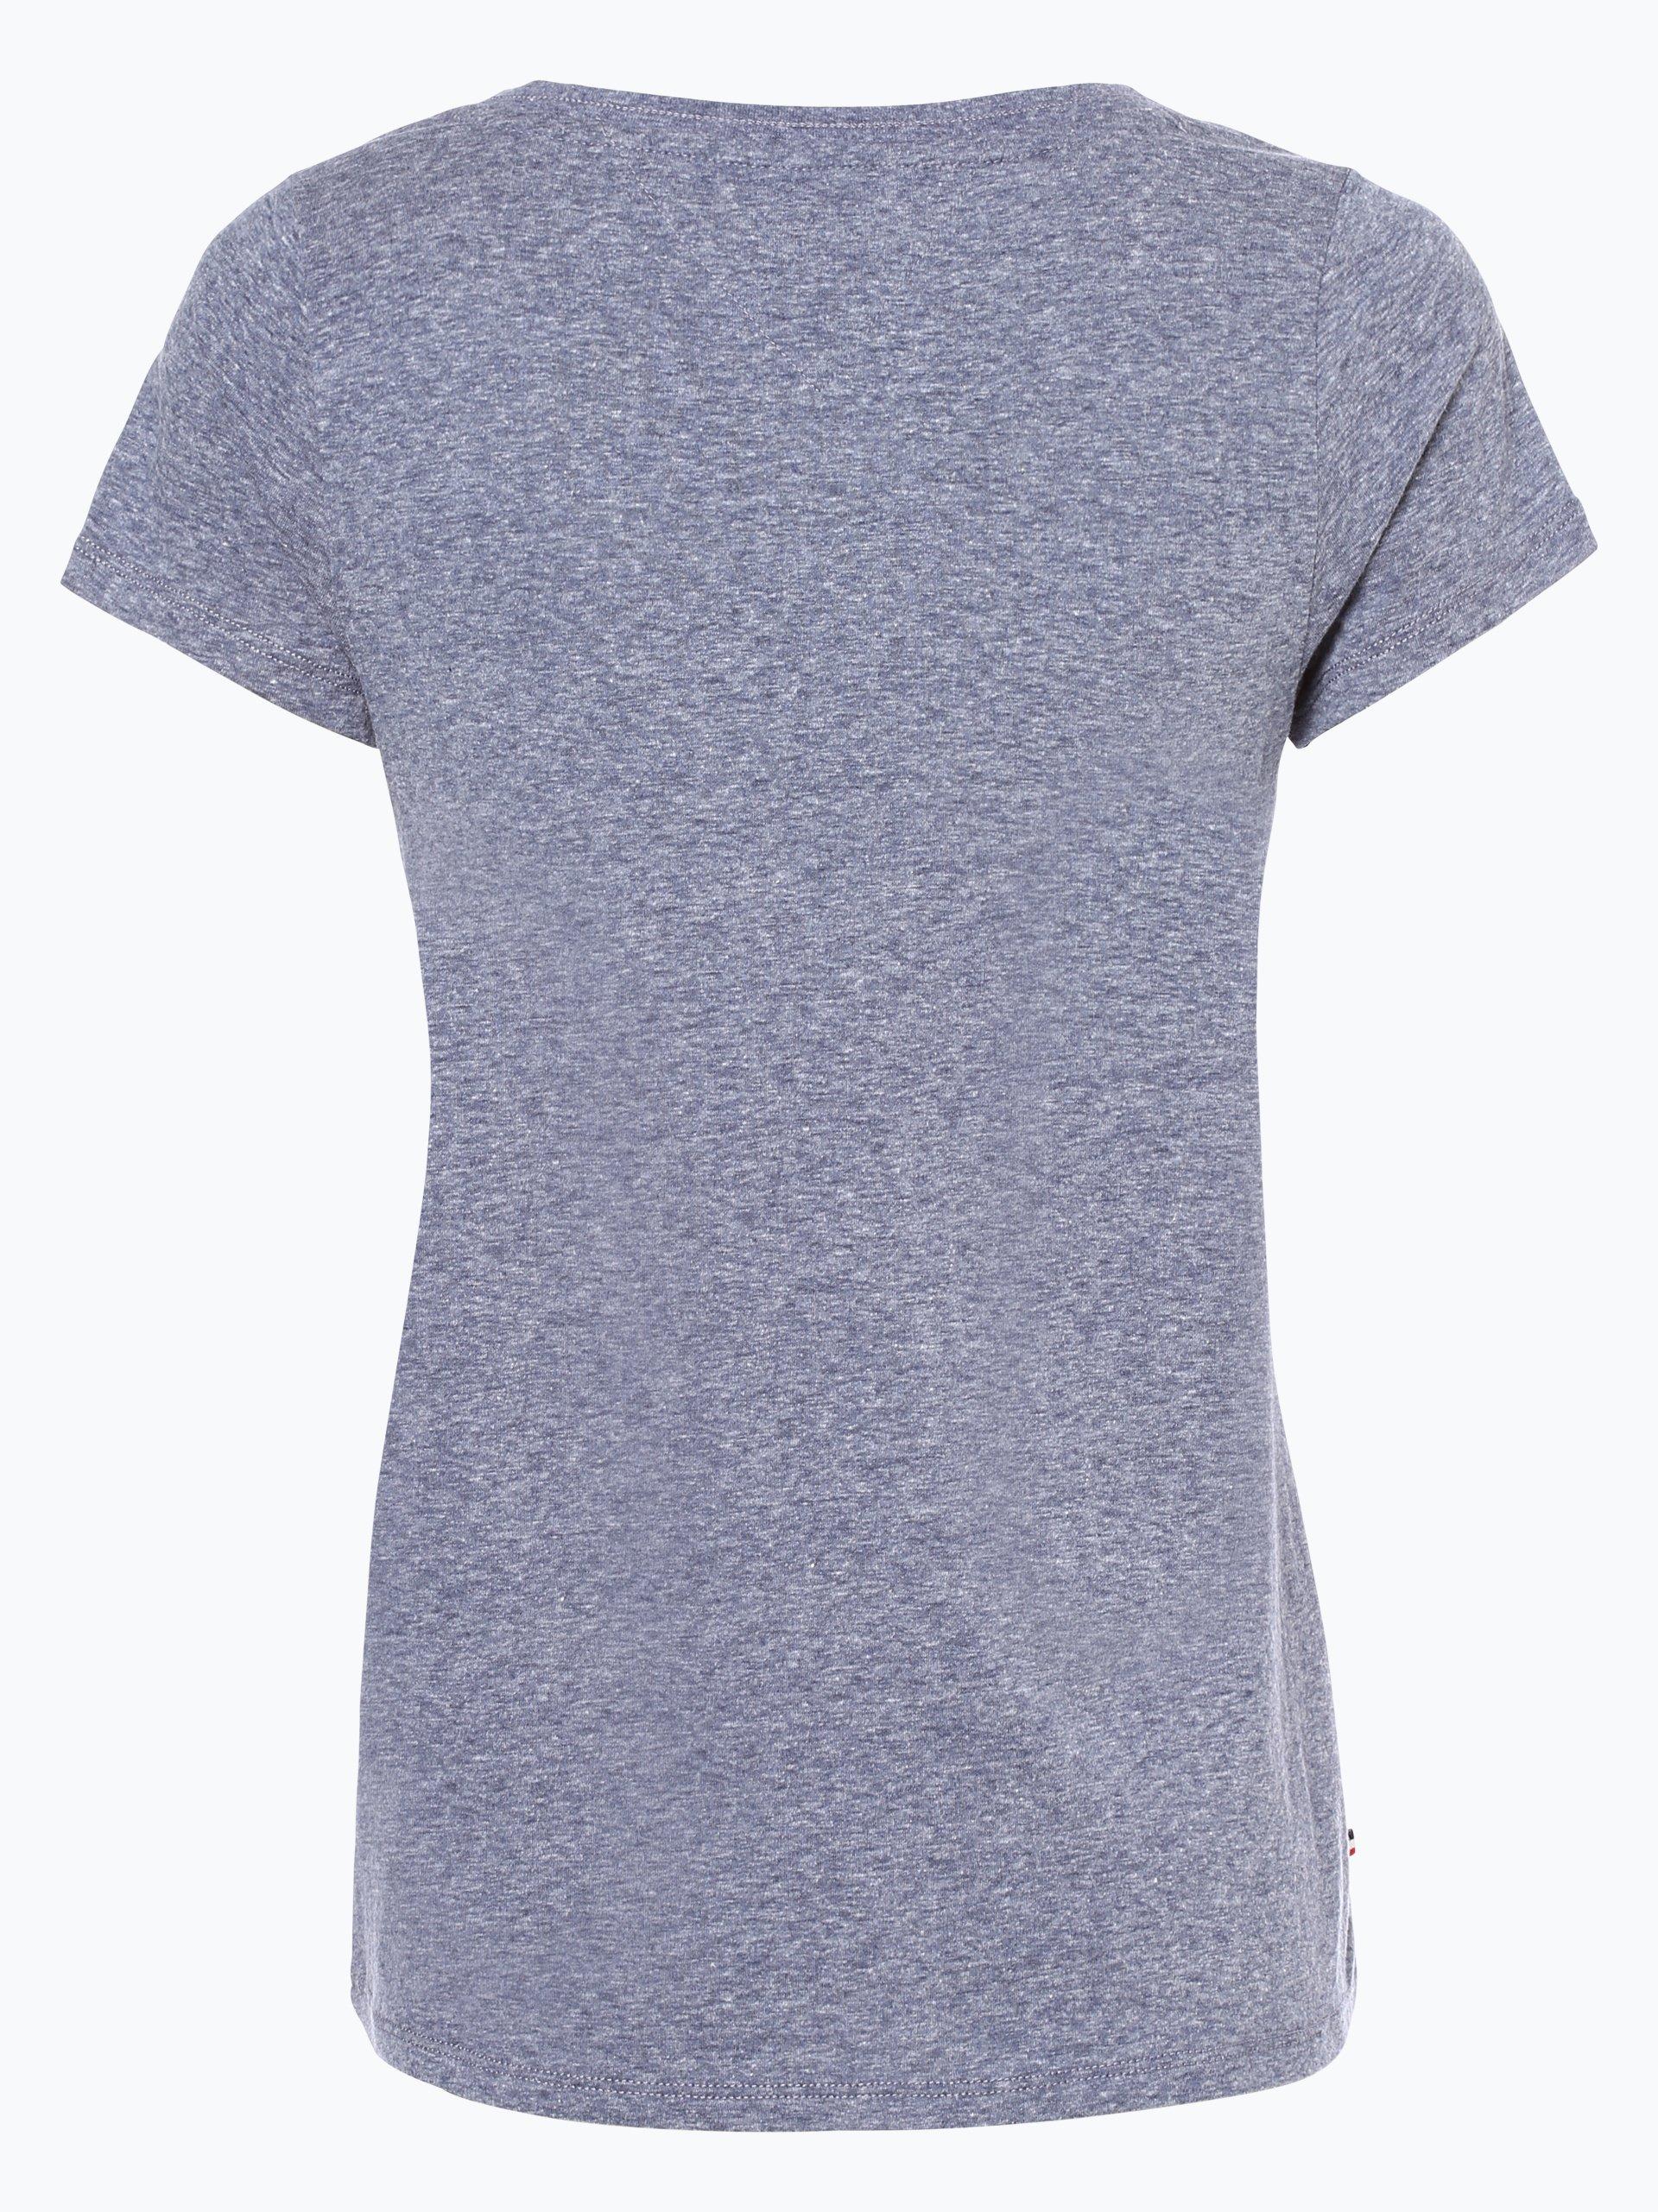 tommy jeans damen t shirt marine blau uni online kaufen. Black Bedroom Furniture Sets. Home Design Ideas